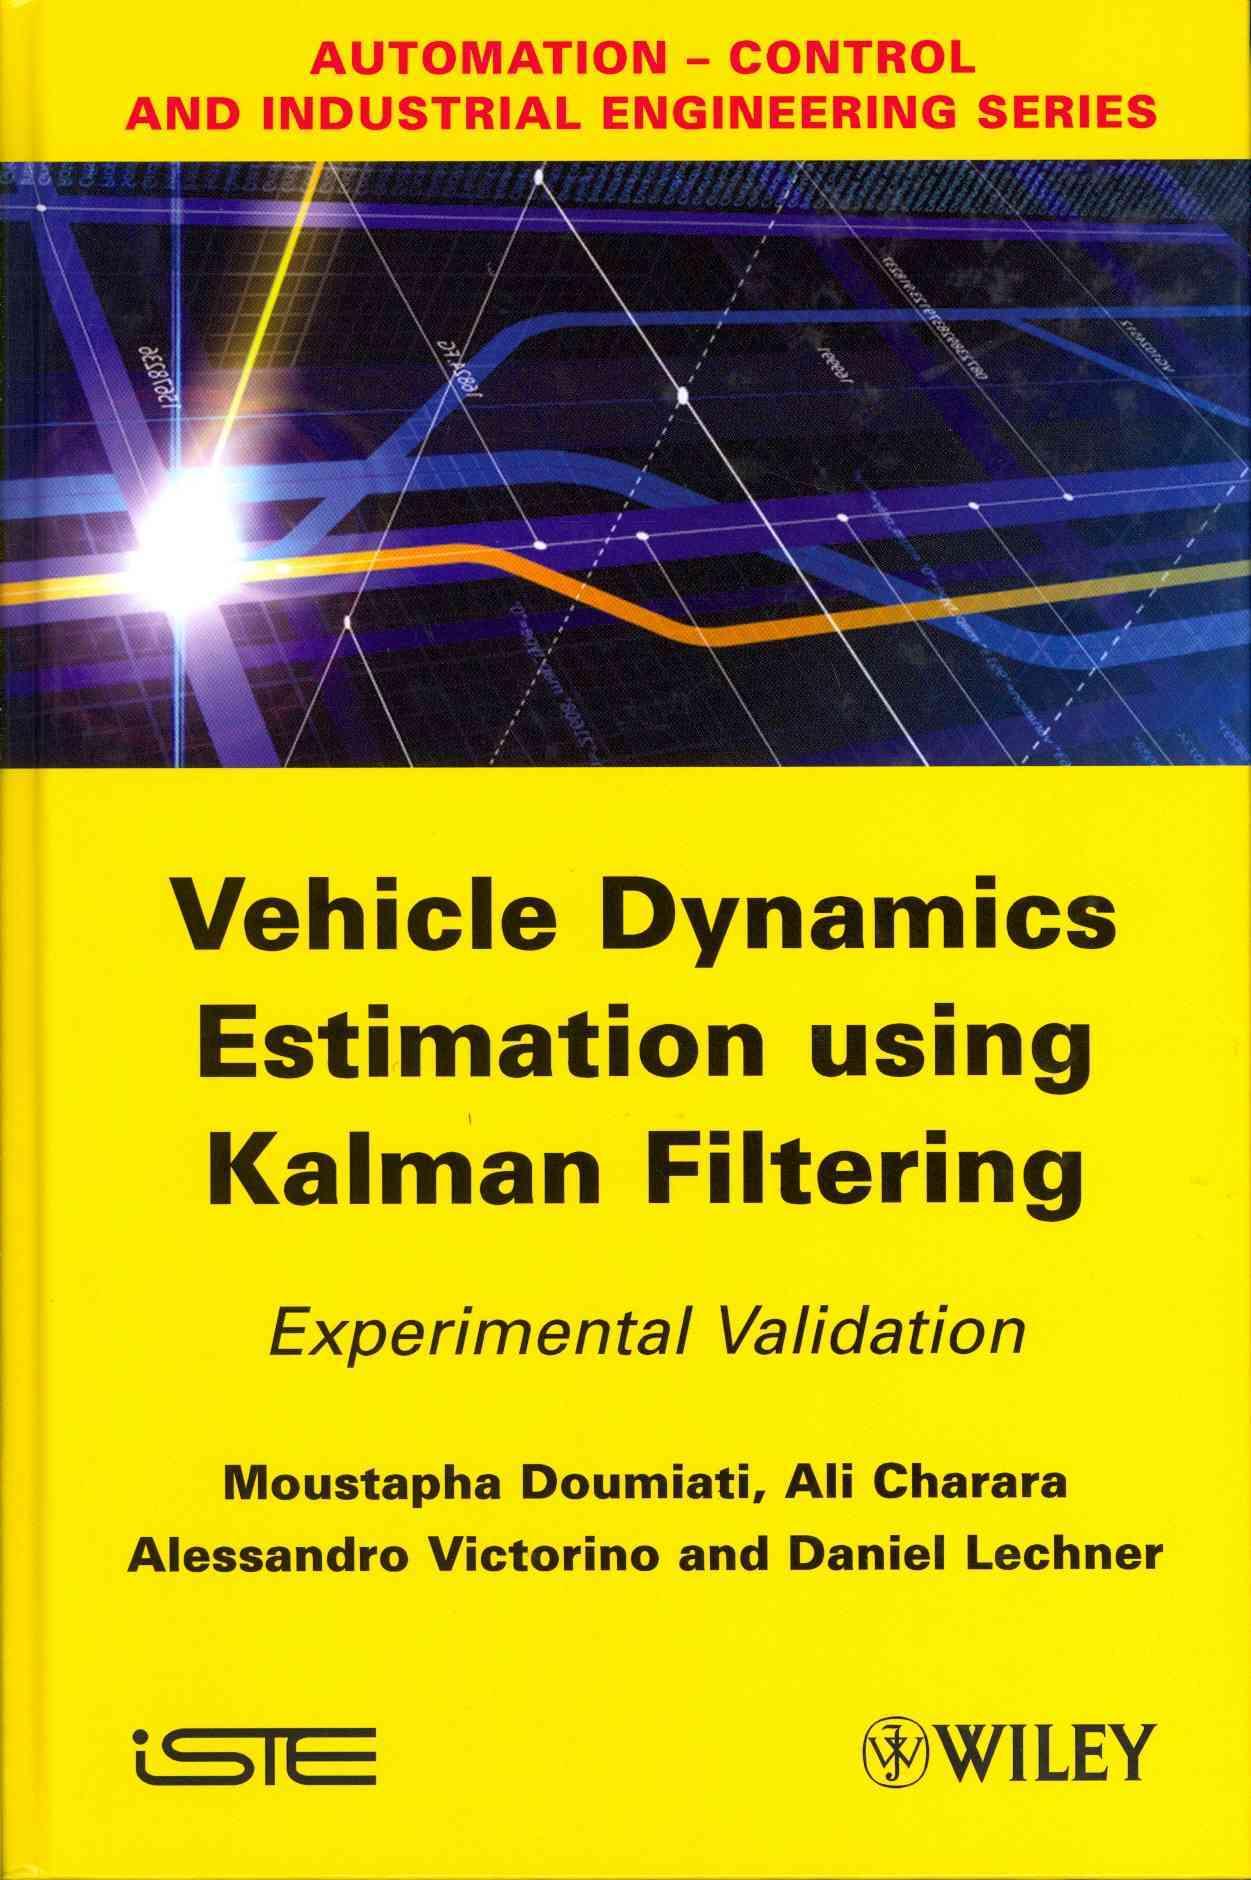 Vehicle Dynamics Estimation Using Kalman Filtering: Experimental Validation (Hardcover)